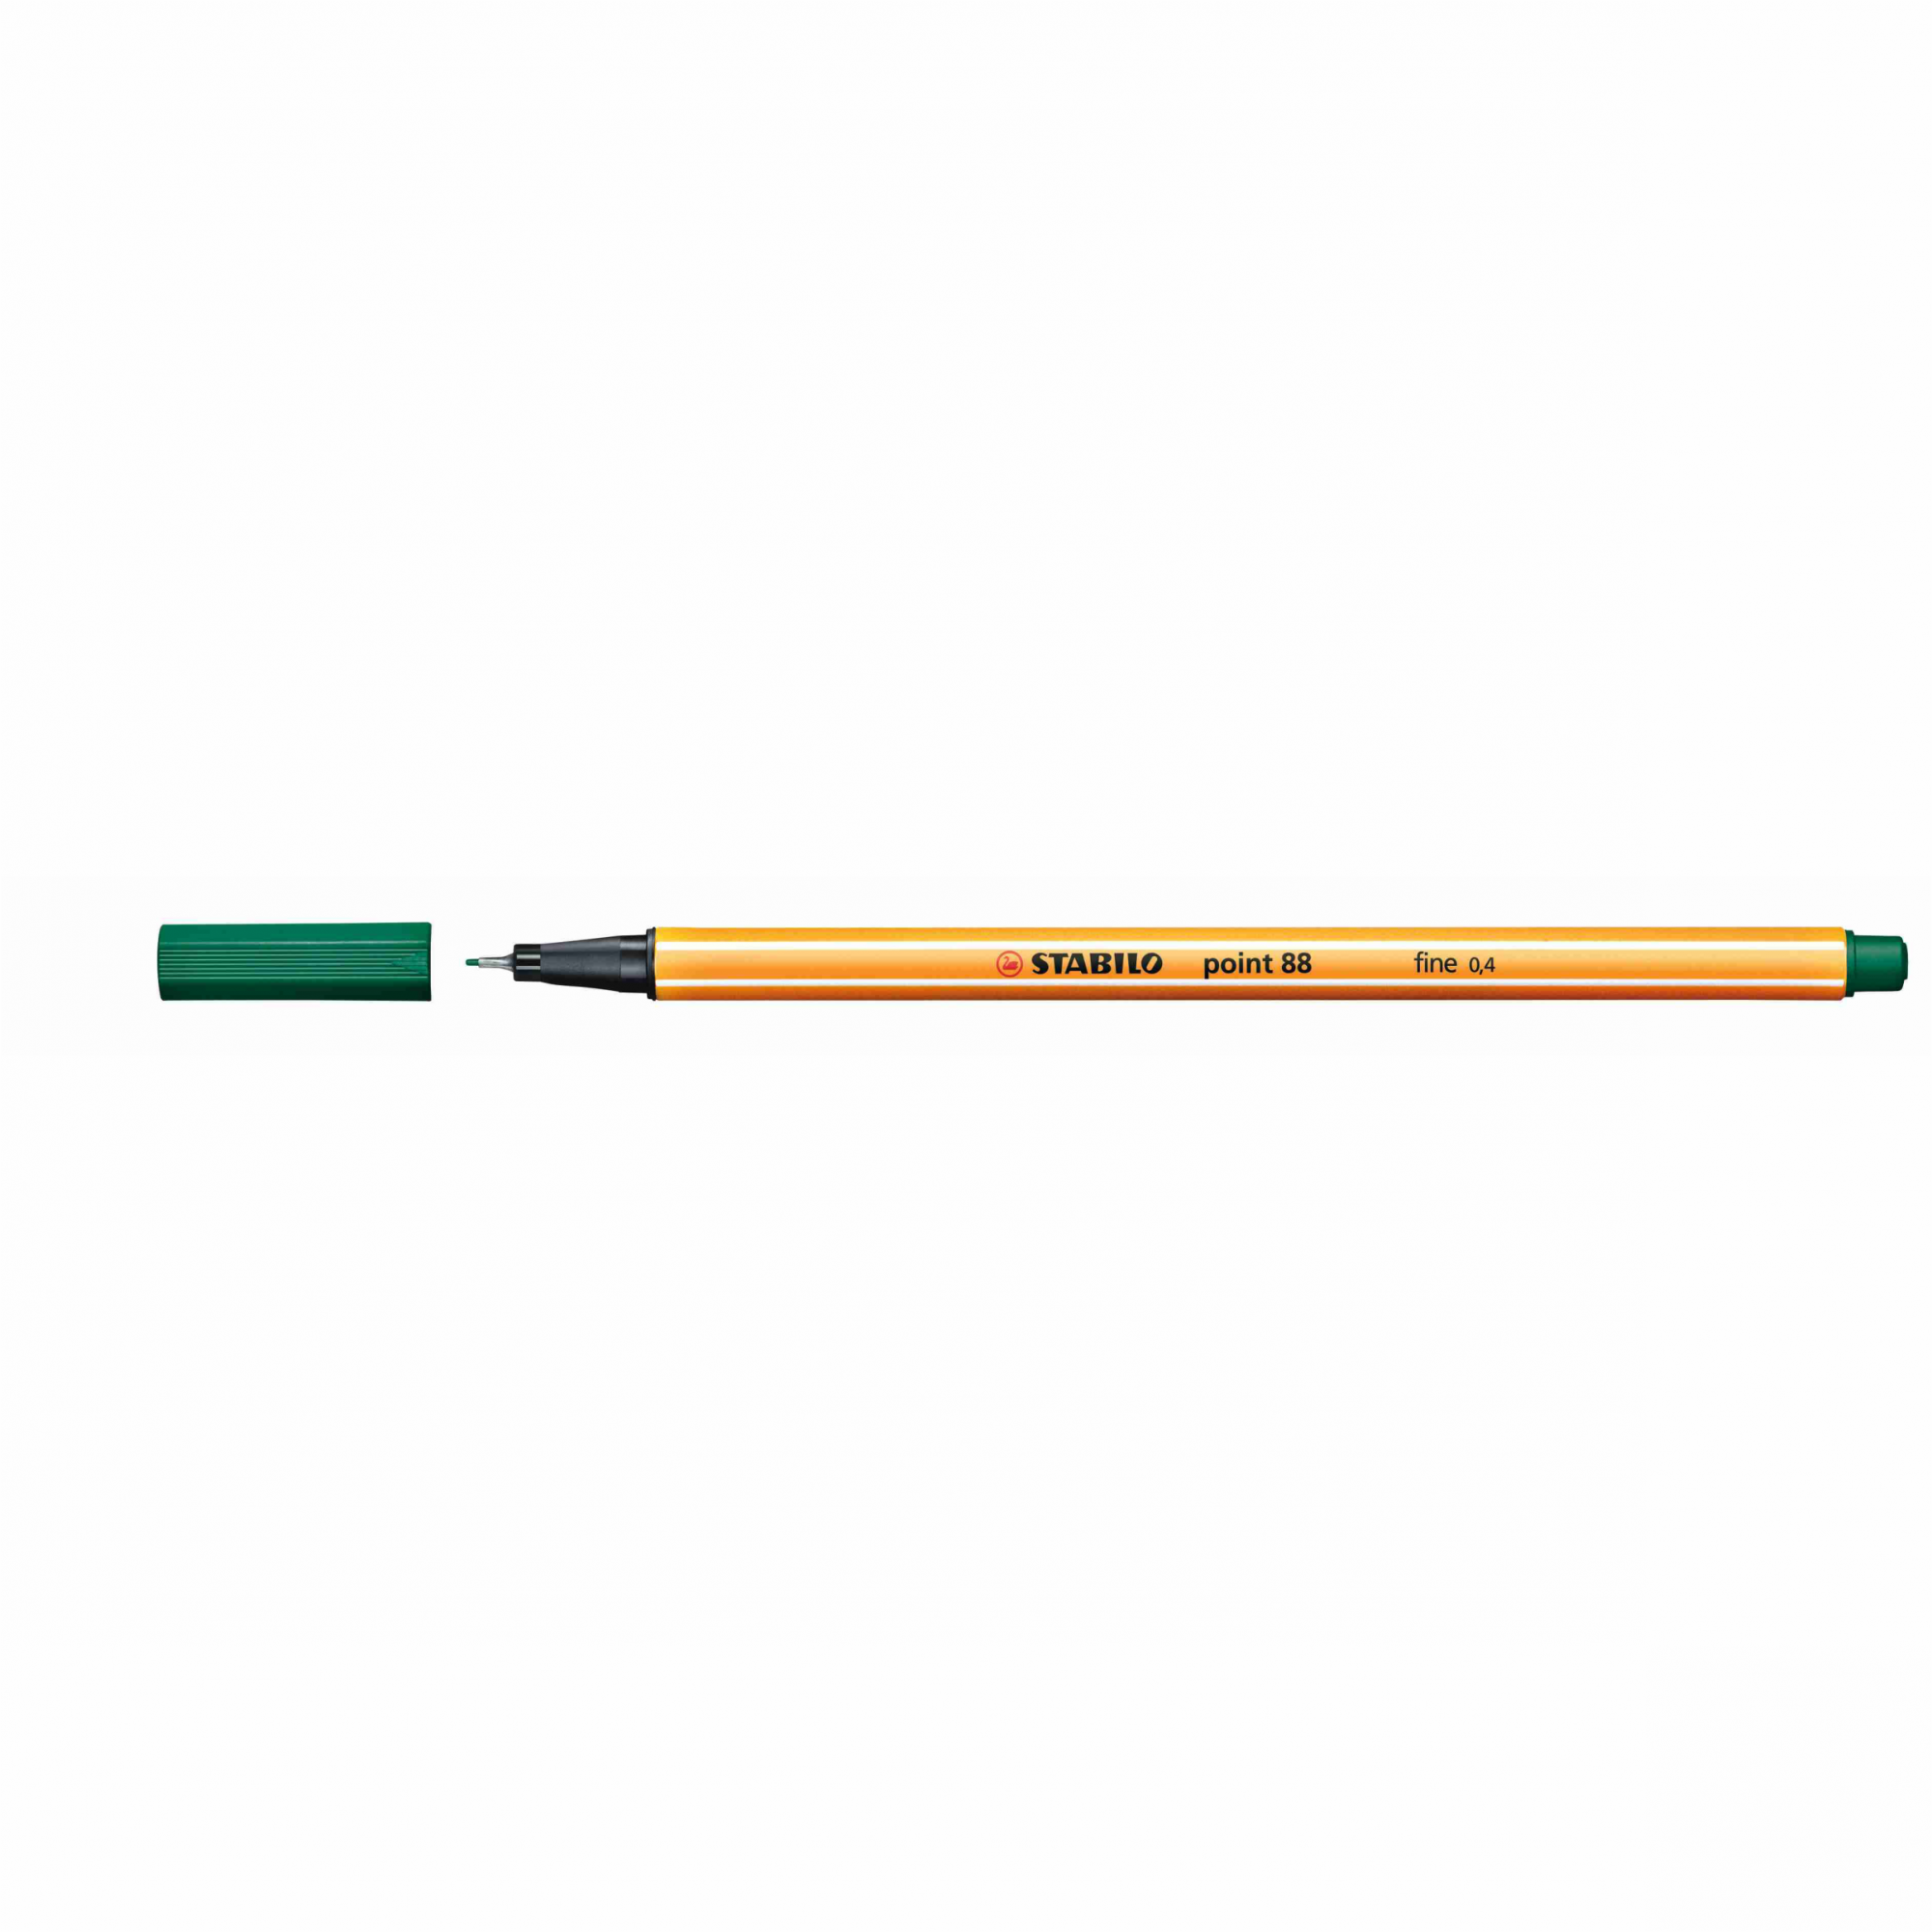 Caneta Hidrográfica 0.4 verde escuro POINT 88 Stabilo